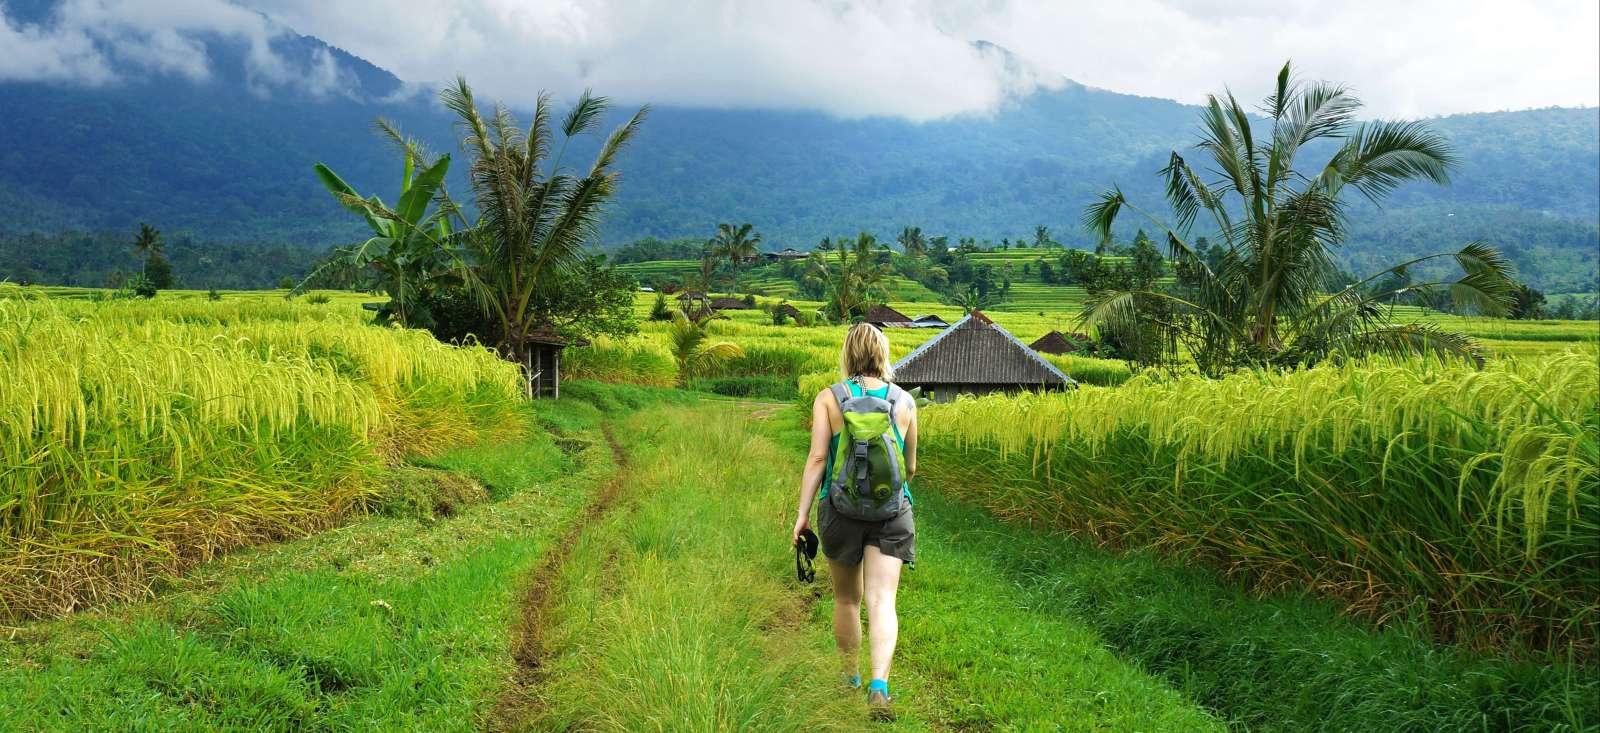 Voyage à pied : Randos Balinaises